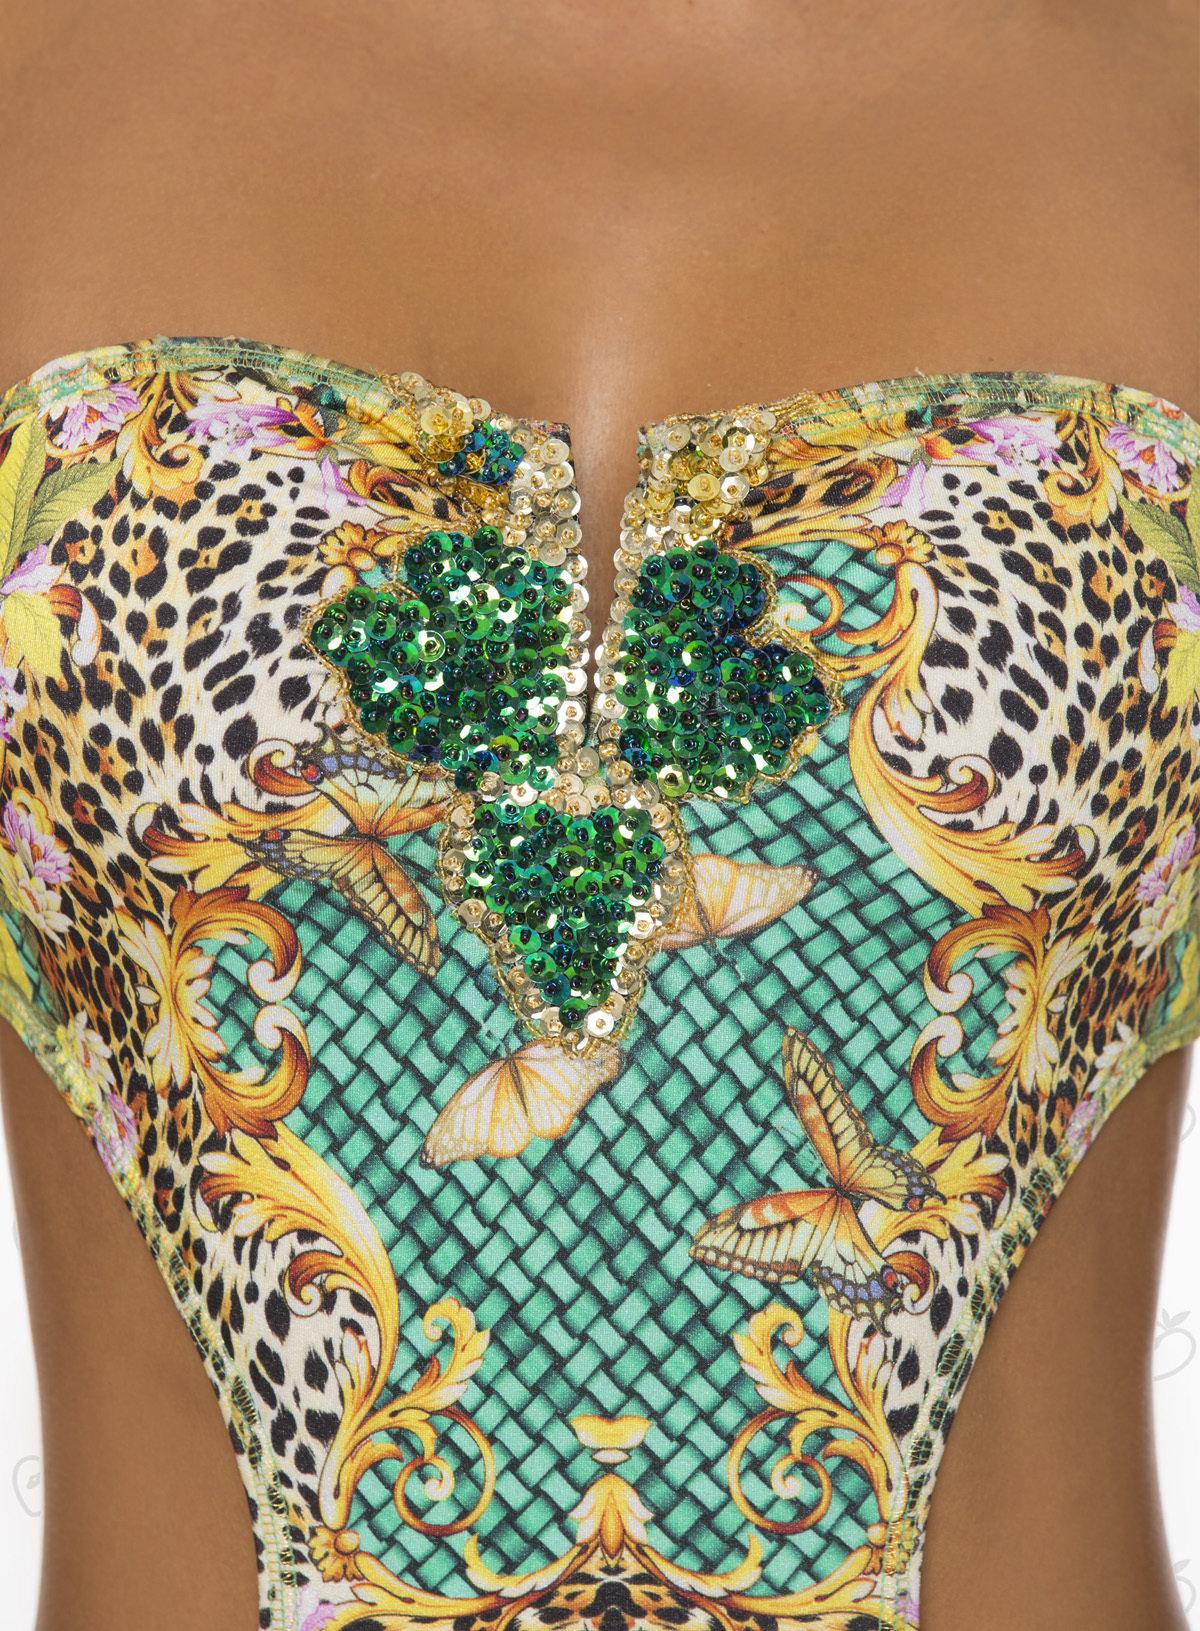 Paradizia Swimwear: Emerald Crystals Jaguar Cutout Monokini (1 Left!)